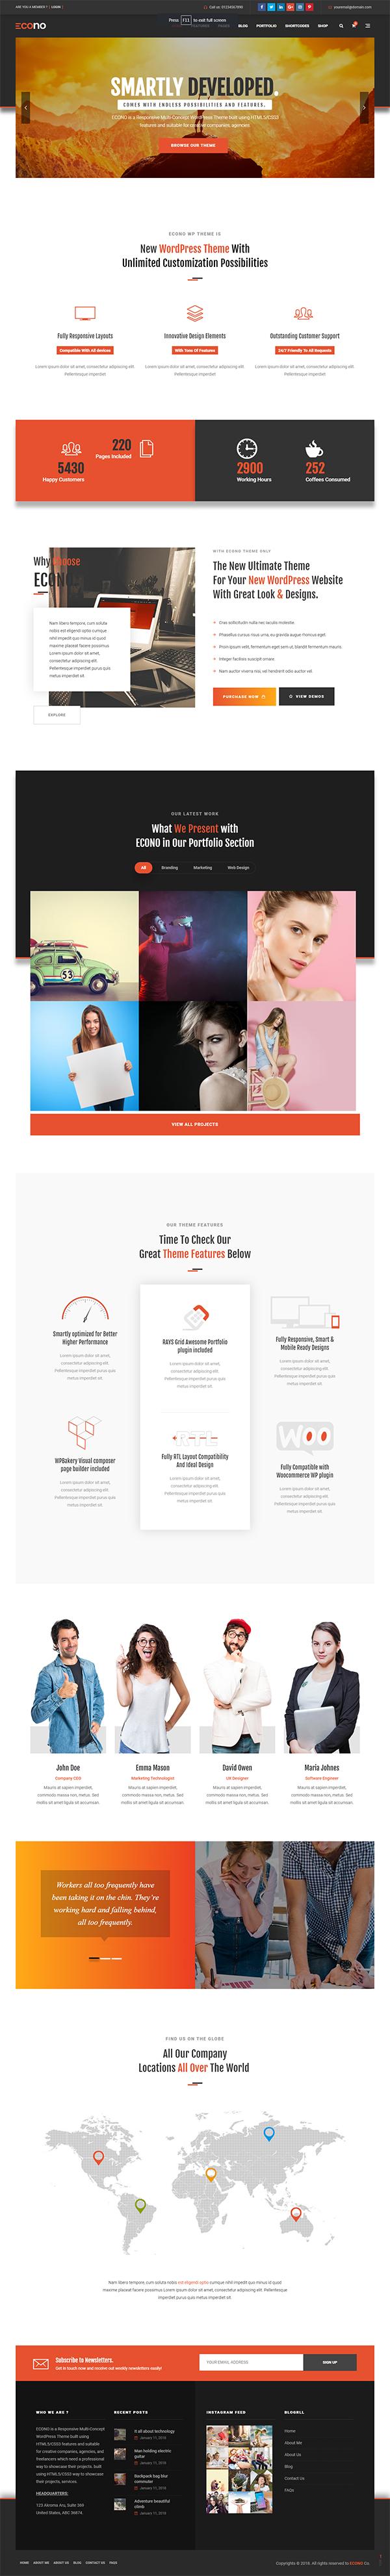 Econo - Creative MultiPurpose WordPress Theme